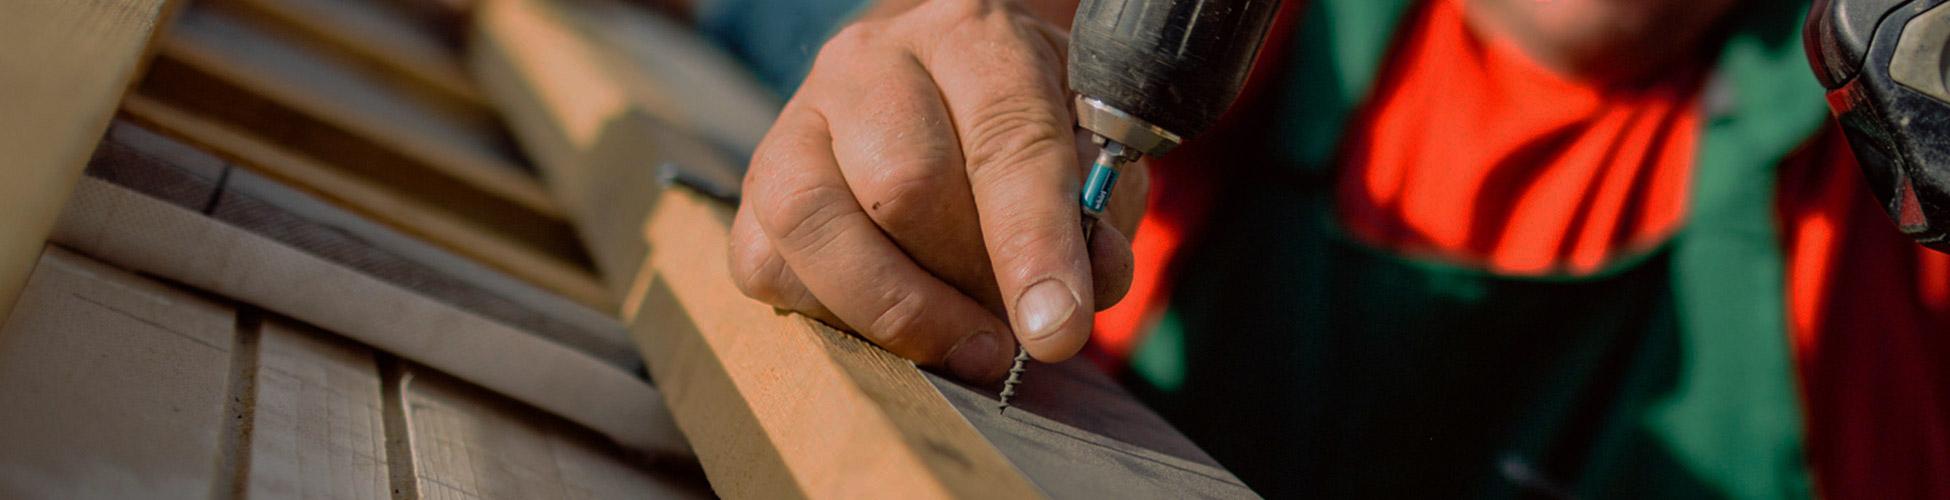 Ocala Roofing Inc. - 4552 NE 23rd Ct Ocala, FL 34479